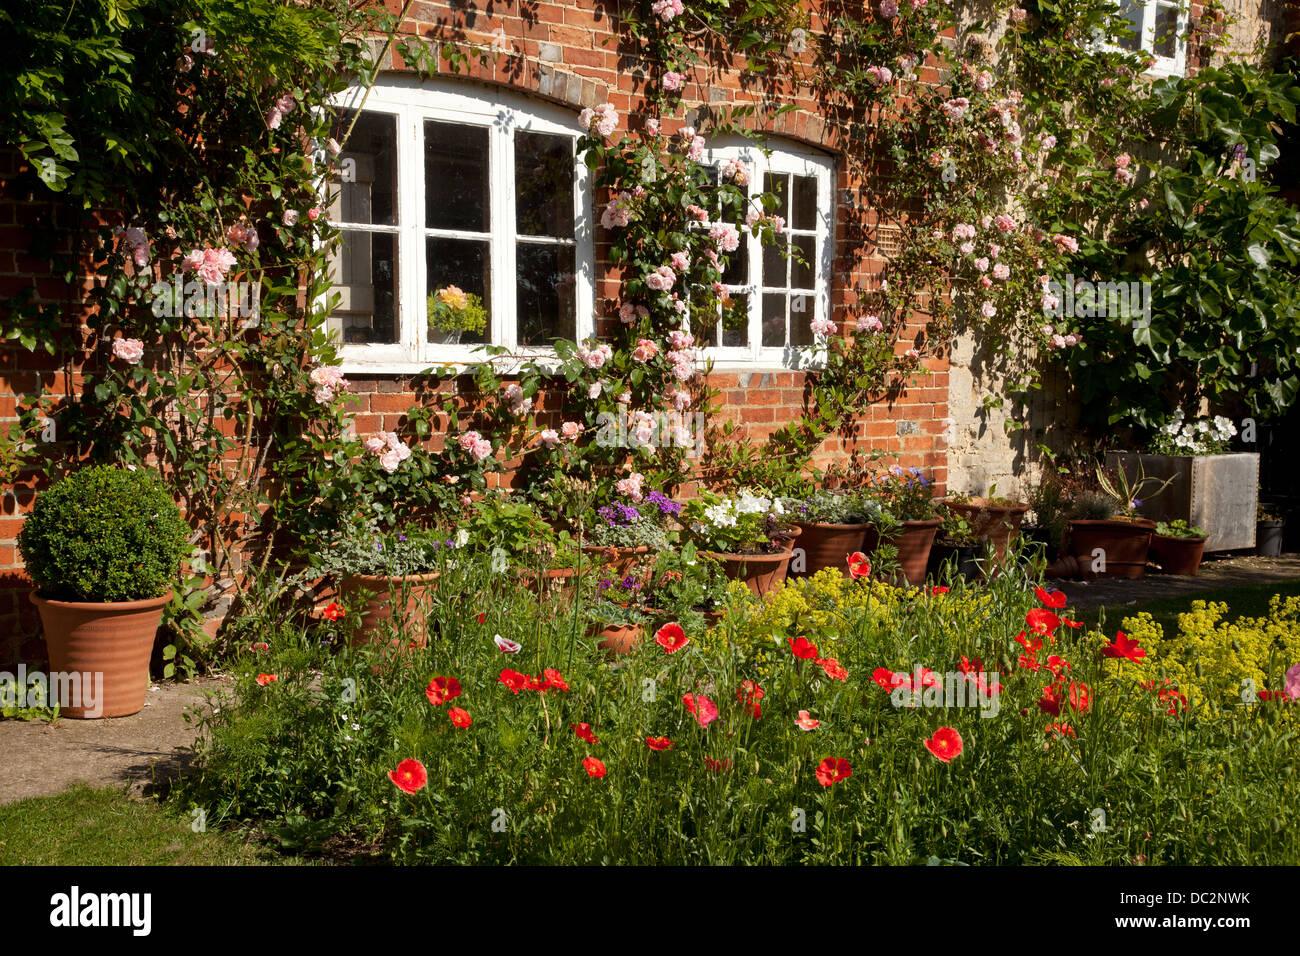 Cottage Garden Roses Stock Photos & Cottage Garden Roses Stock ...